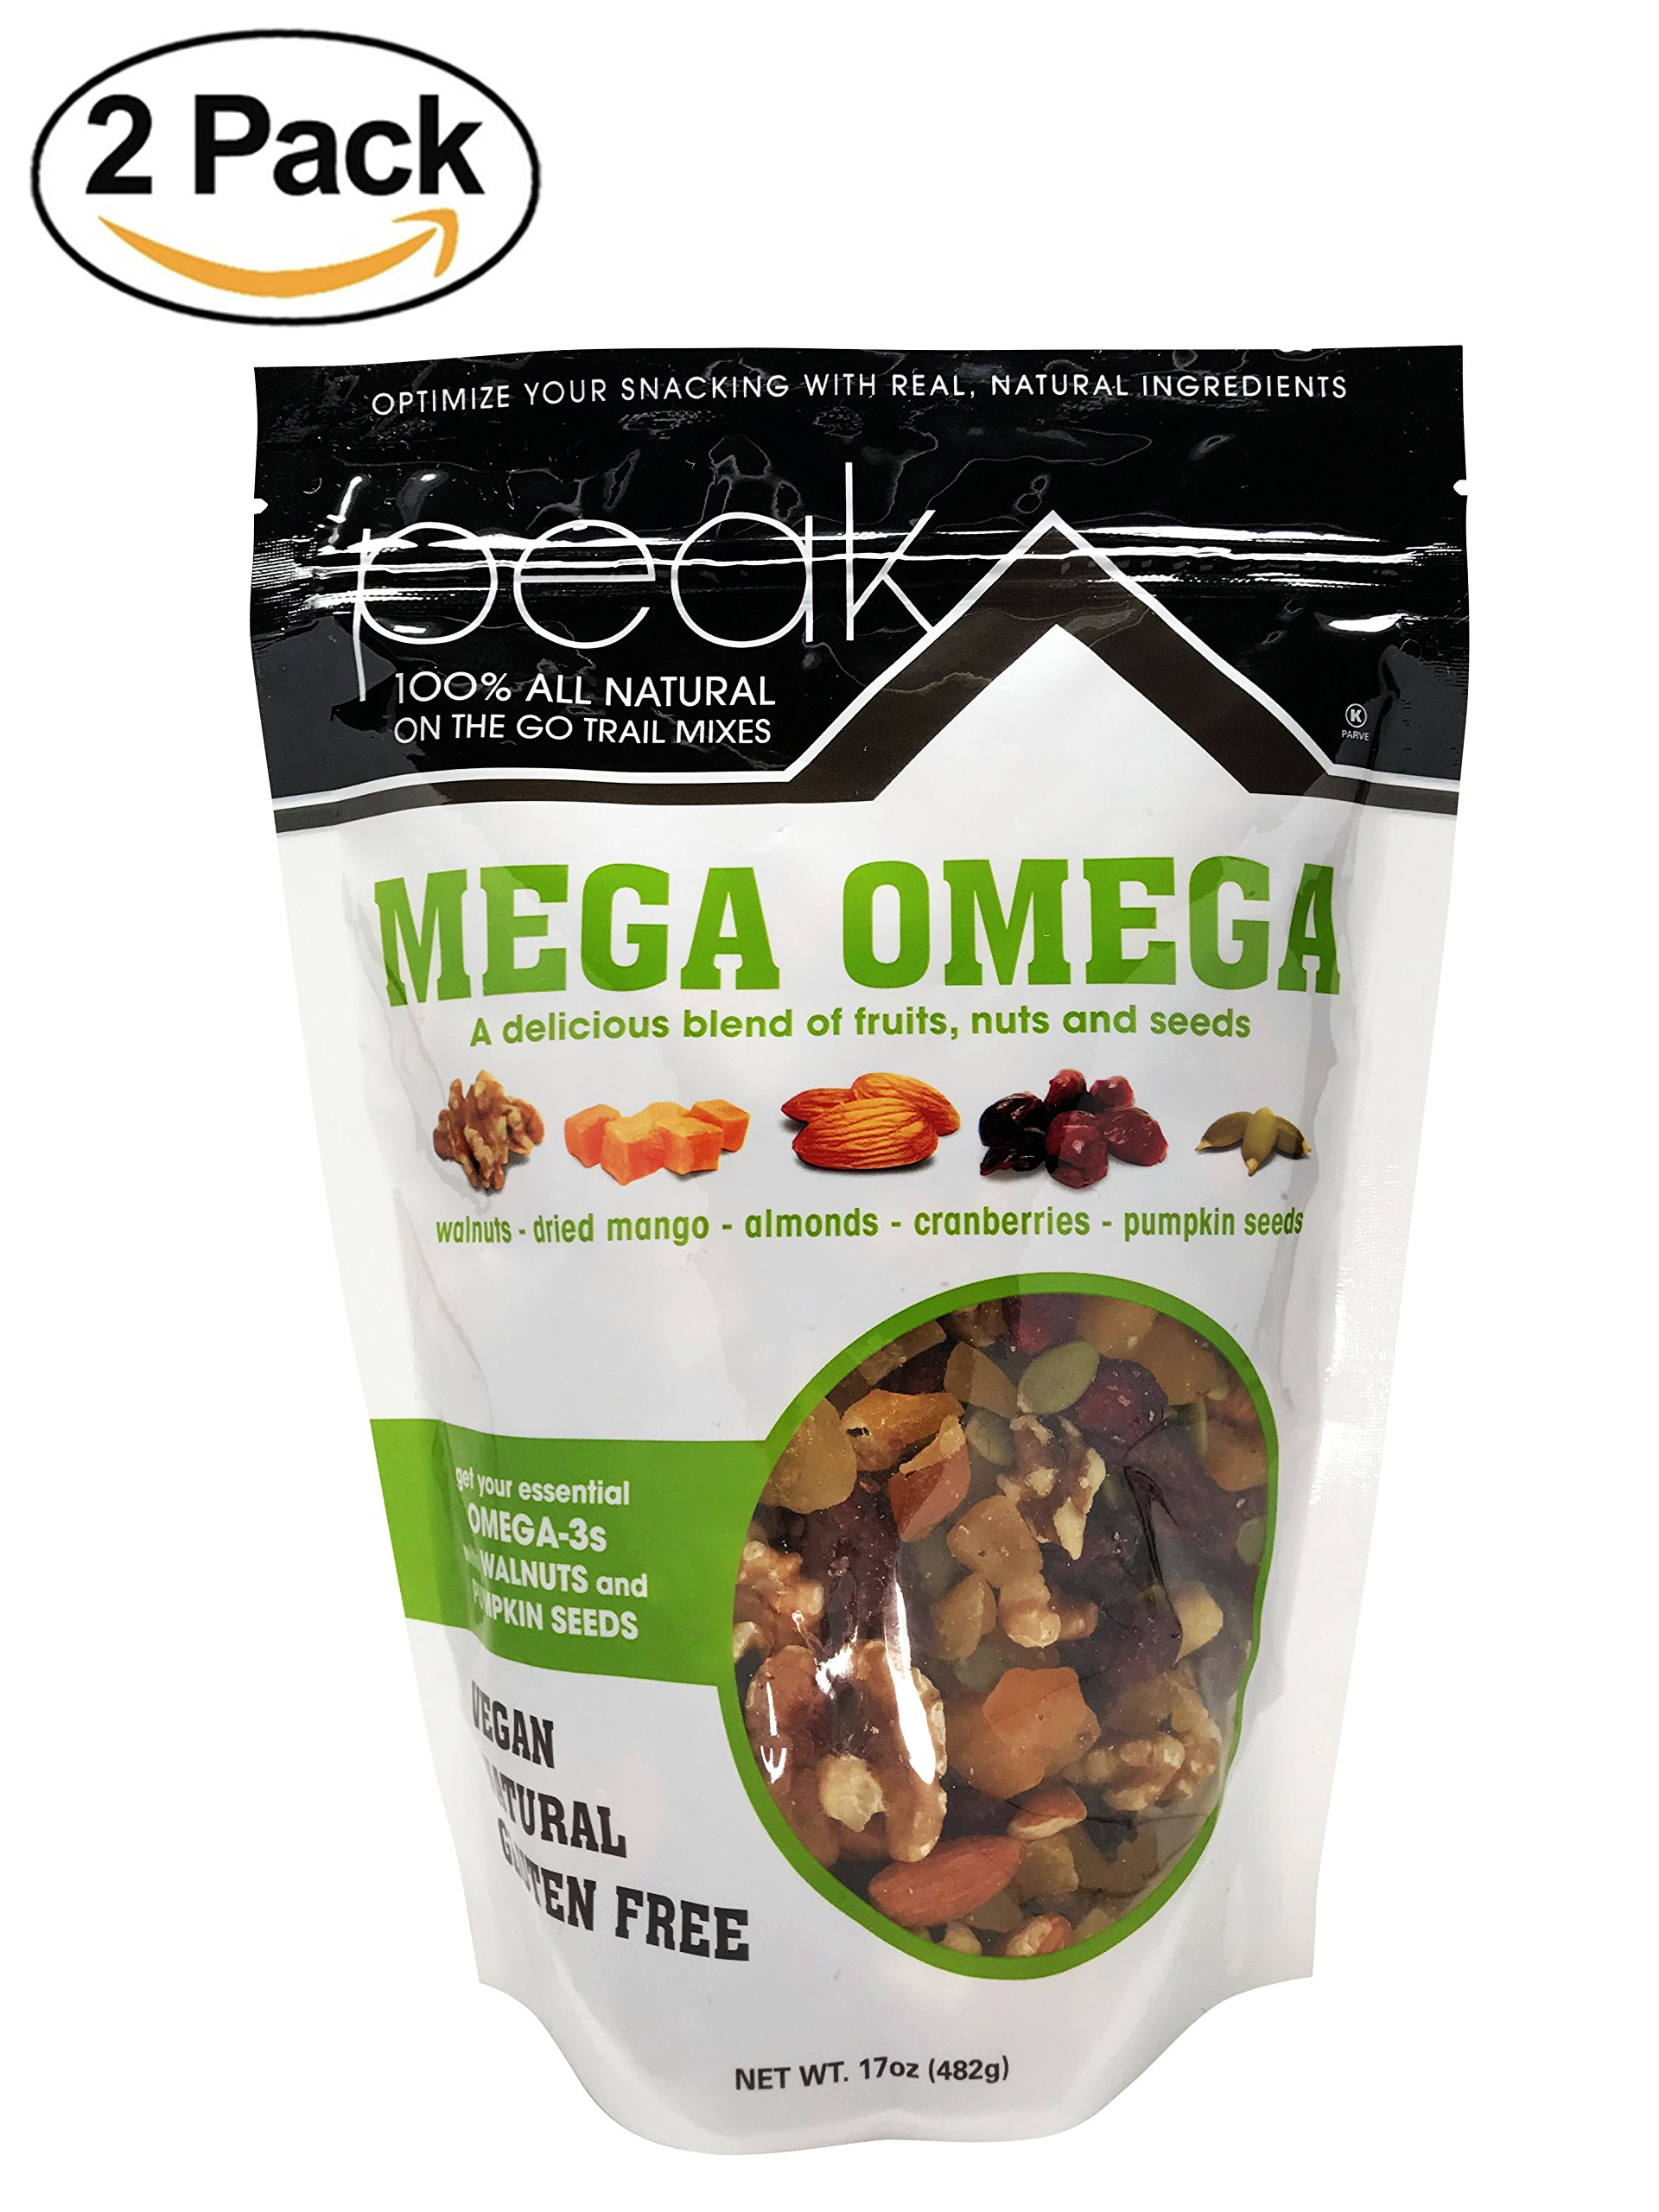 Peak Trail Mix -Mega Omega,100% All Natural Mix that are rich in Omega-3s (Walnut,Dried Mango,Almonds,Cranberries,Pumpkin Seeds) - Vegan, Gluten Free Snacks.